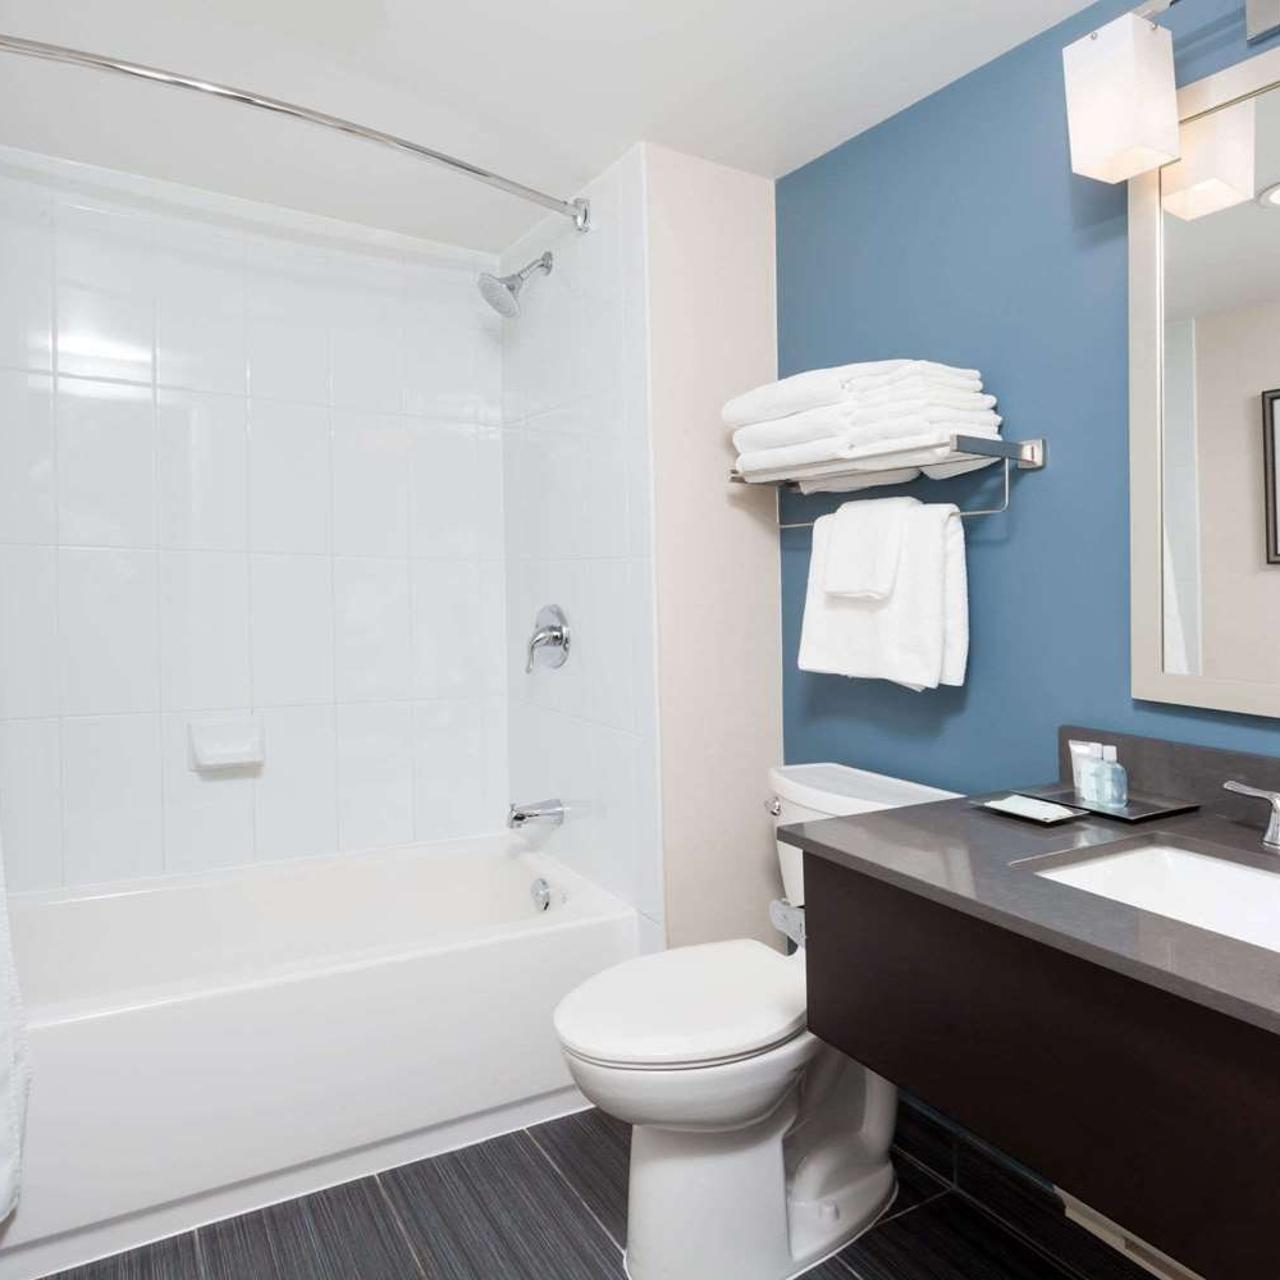 Hotel Wyndham Garden Niagara Falls In Niagara Falls Ontario Hrs